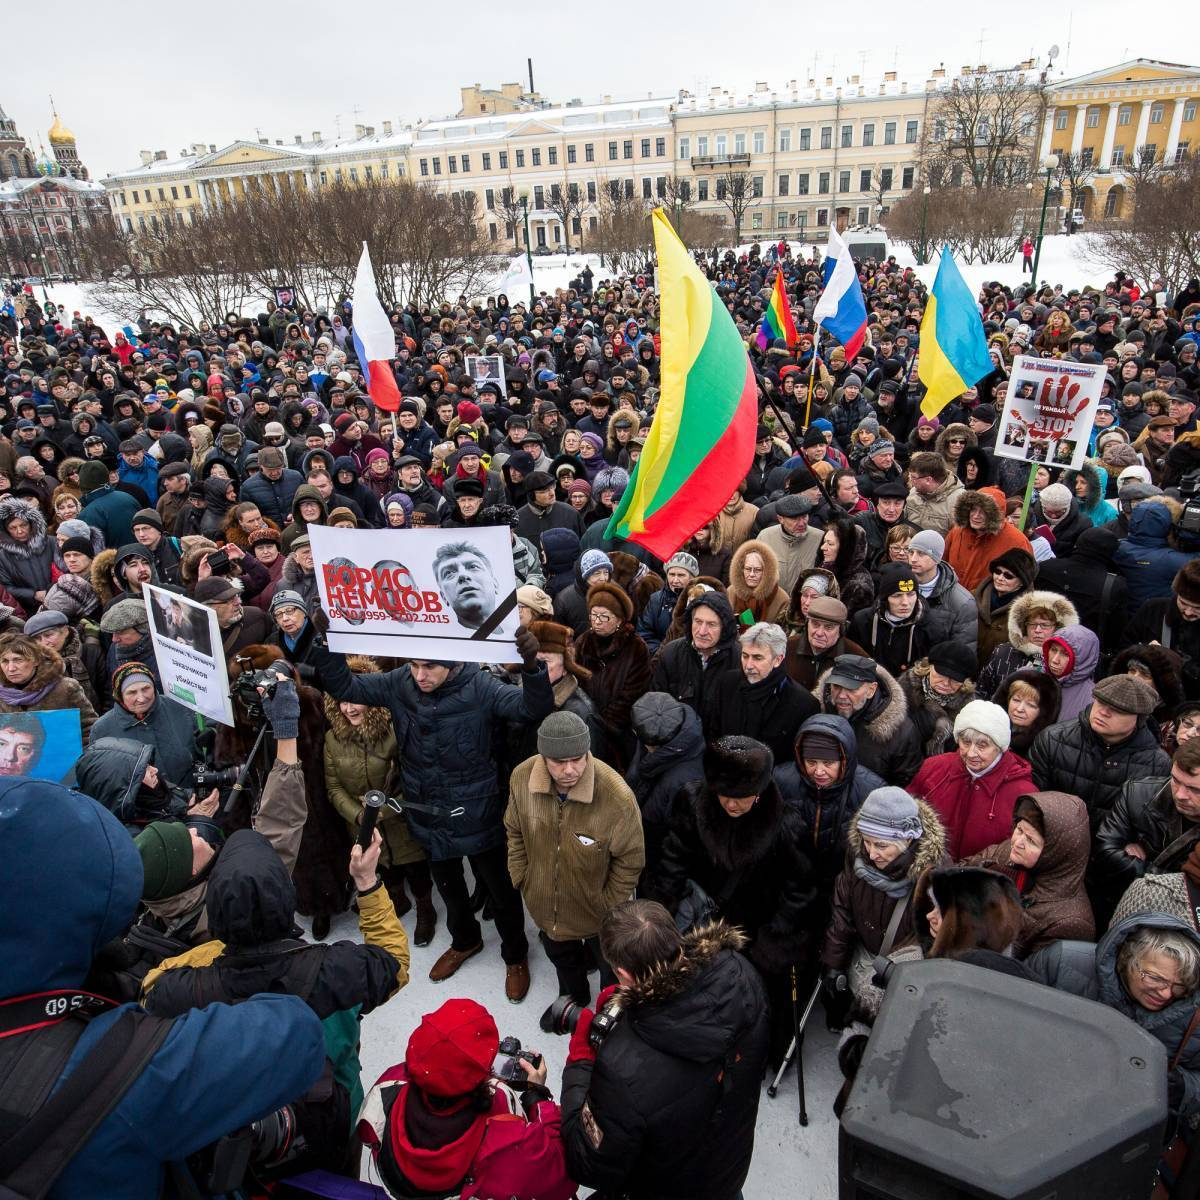 всего ассортимента фото с митинга бориса немцова в санкт петербурге заявки